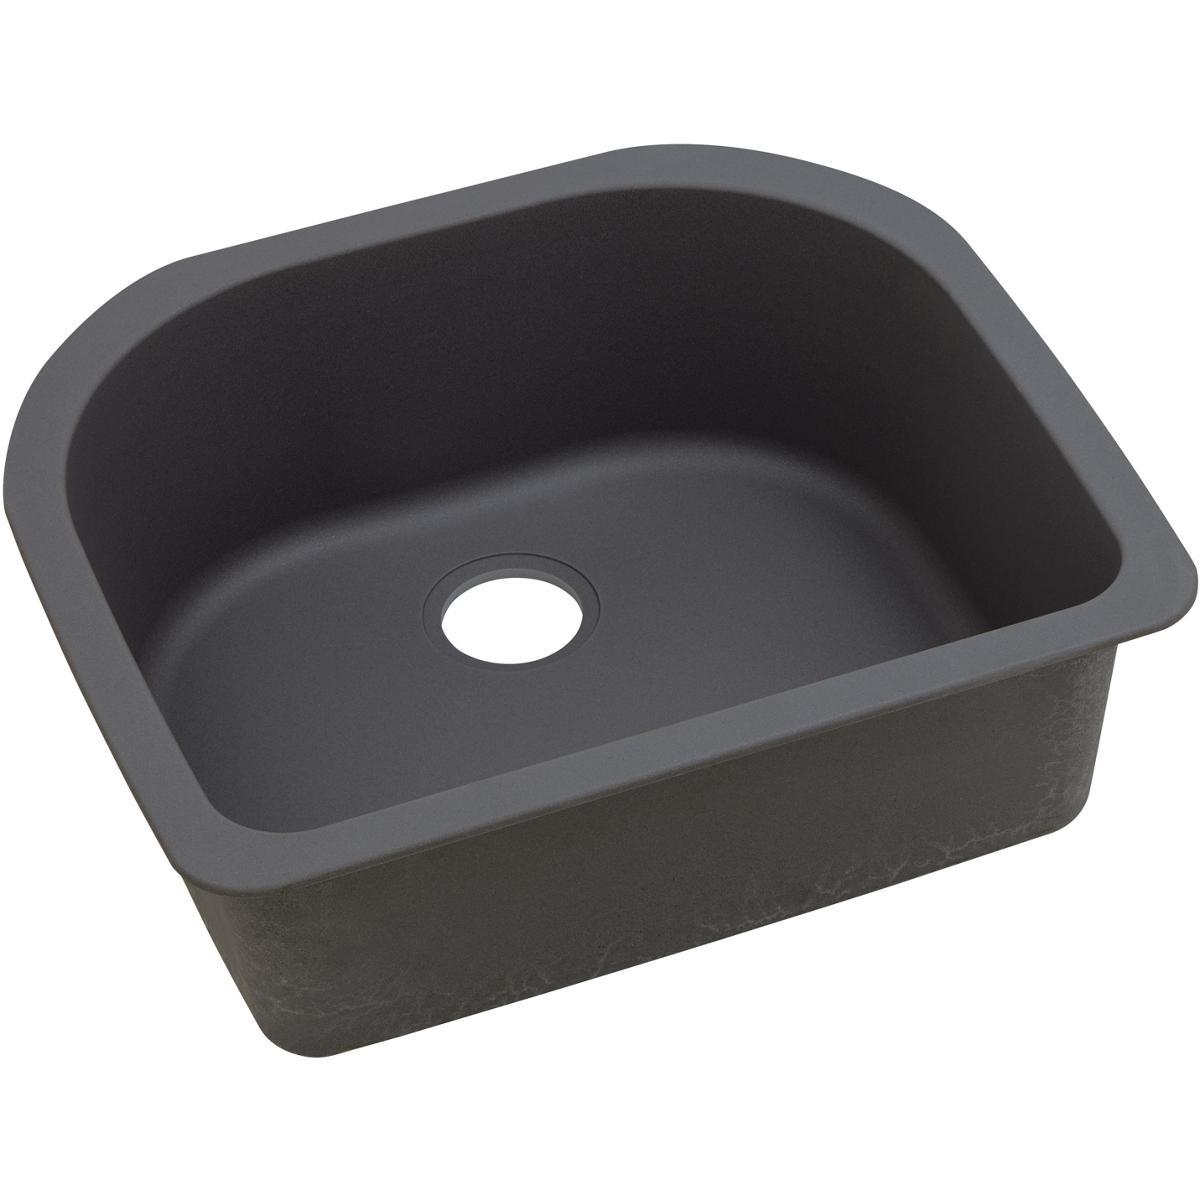 Elkay Quartz Luxe 25 x 22 x 8.5 Single Undermount Sink Caviar